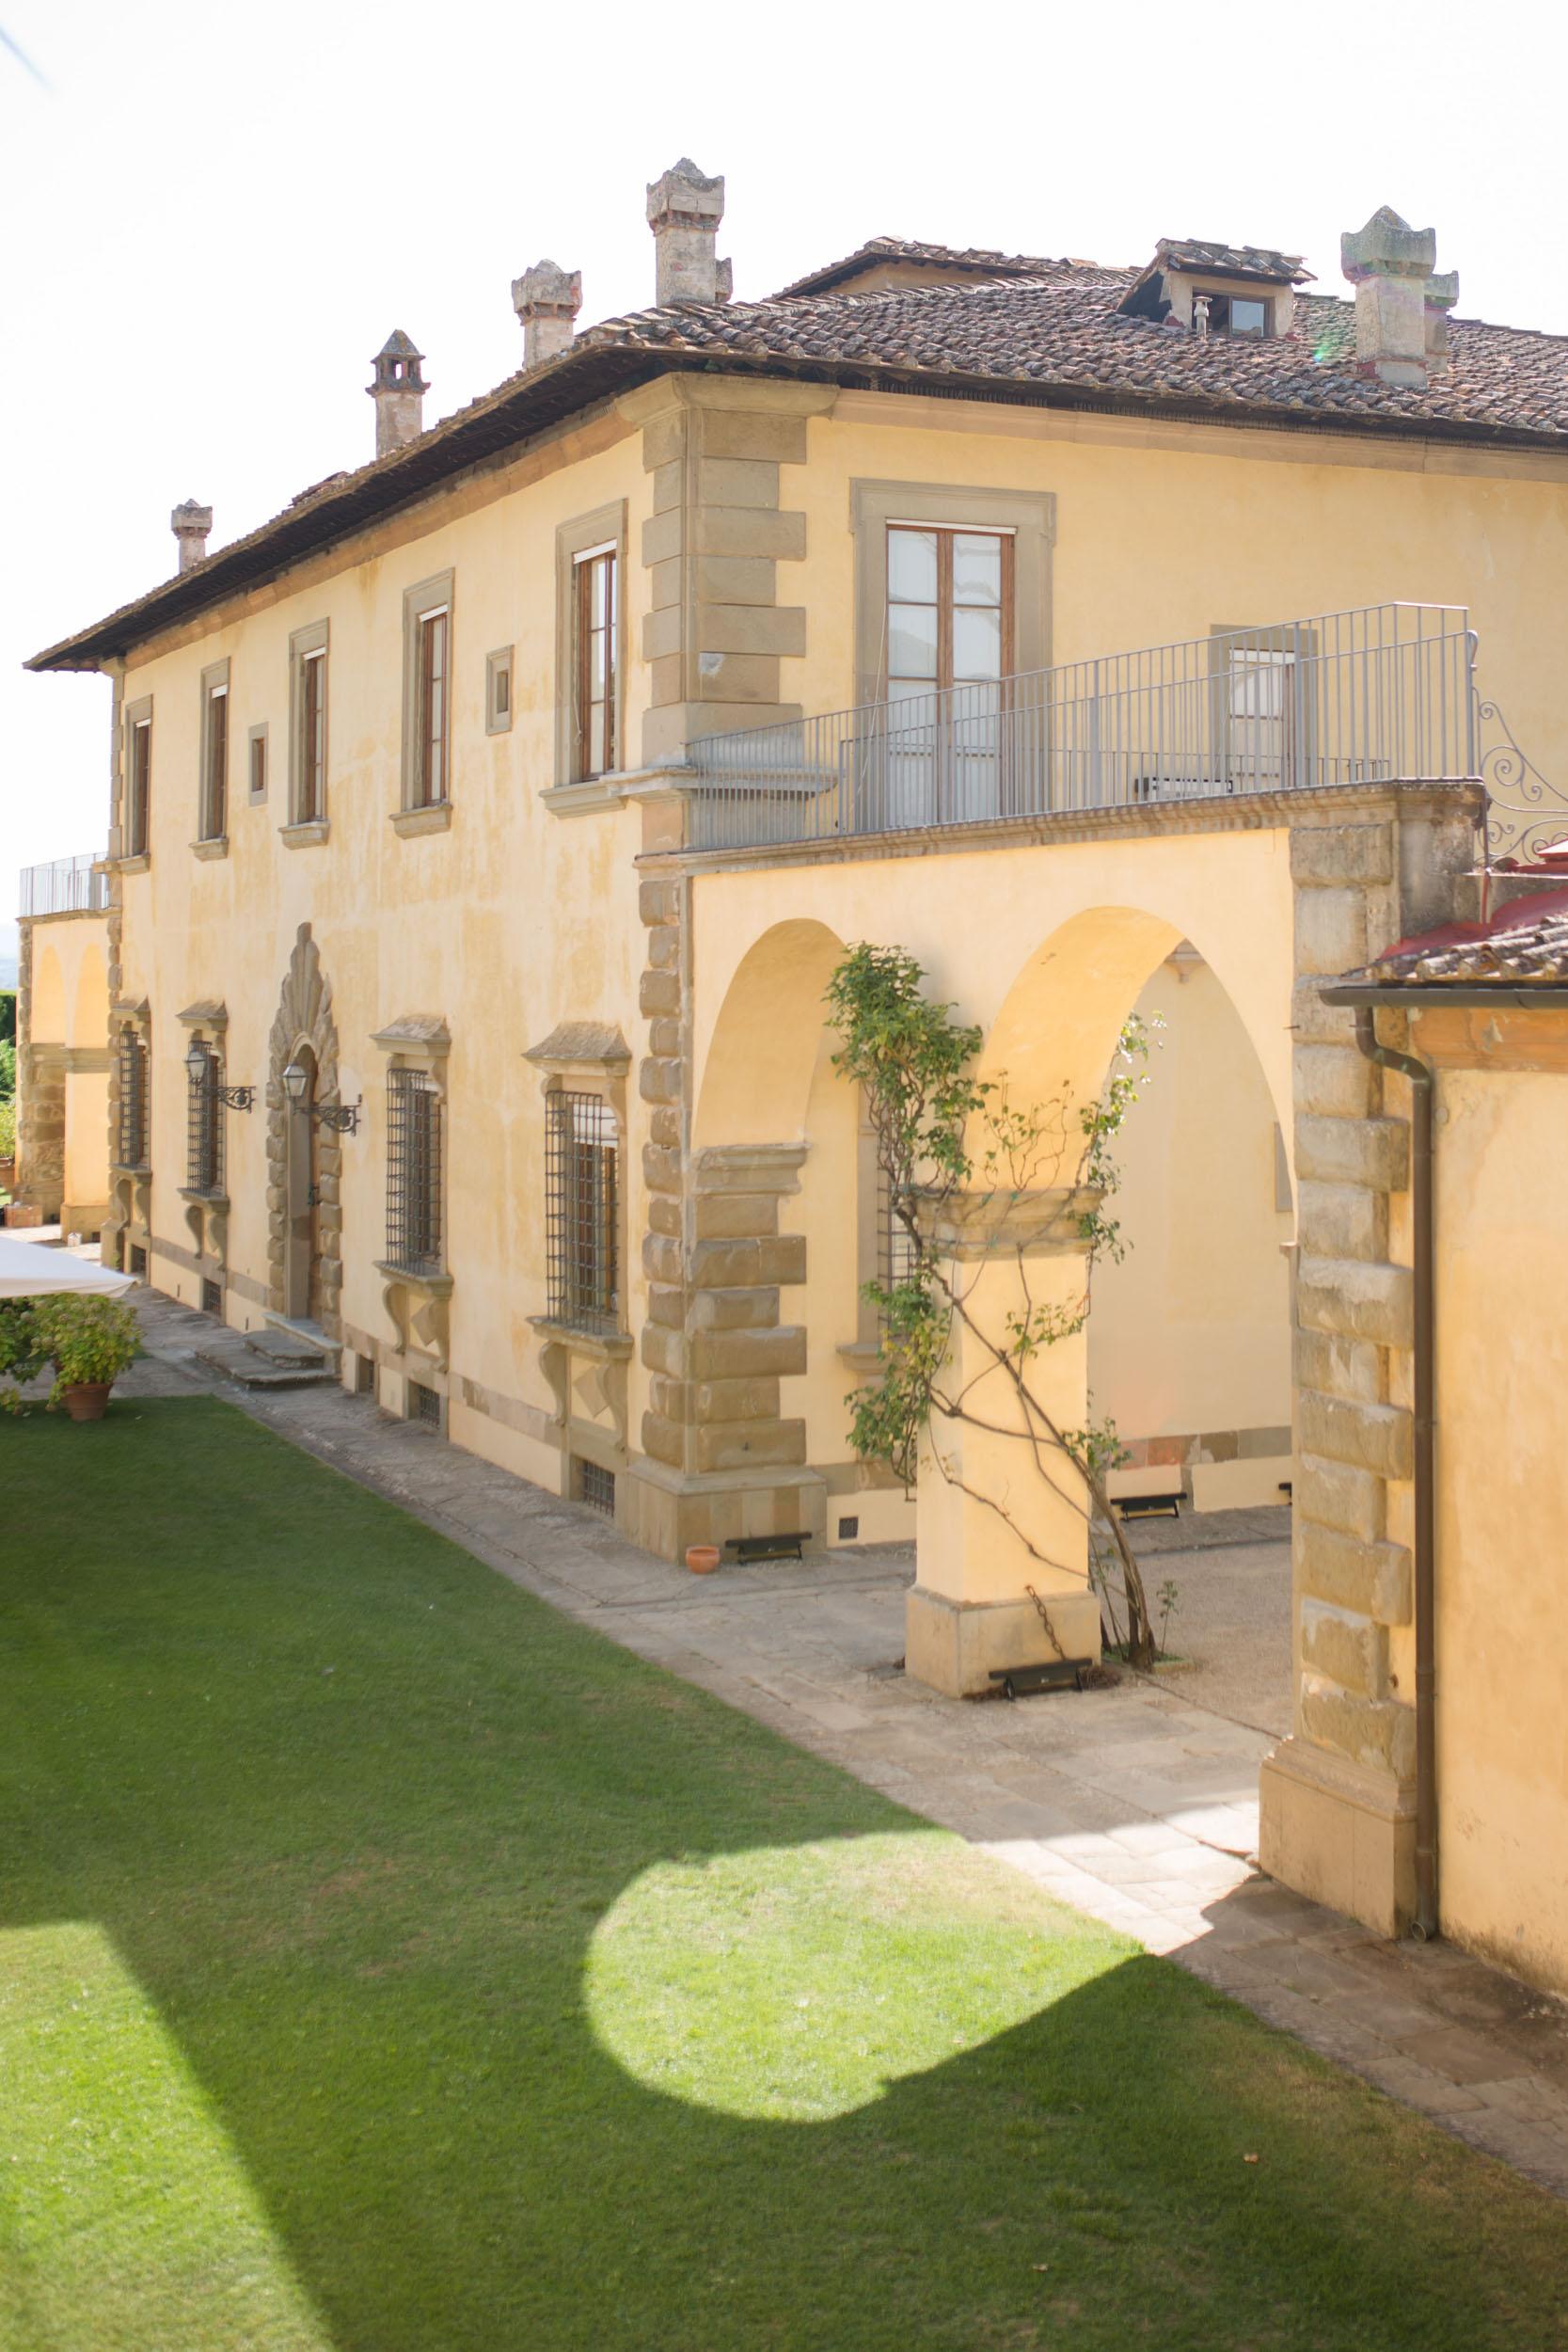 villa-gamberaia-florence-italy-destination-wedding-31.jpg